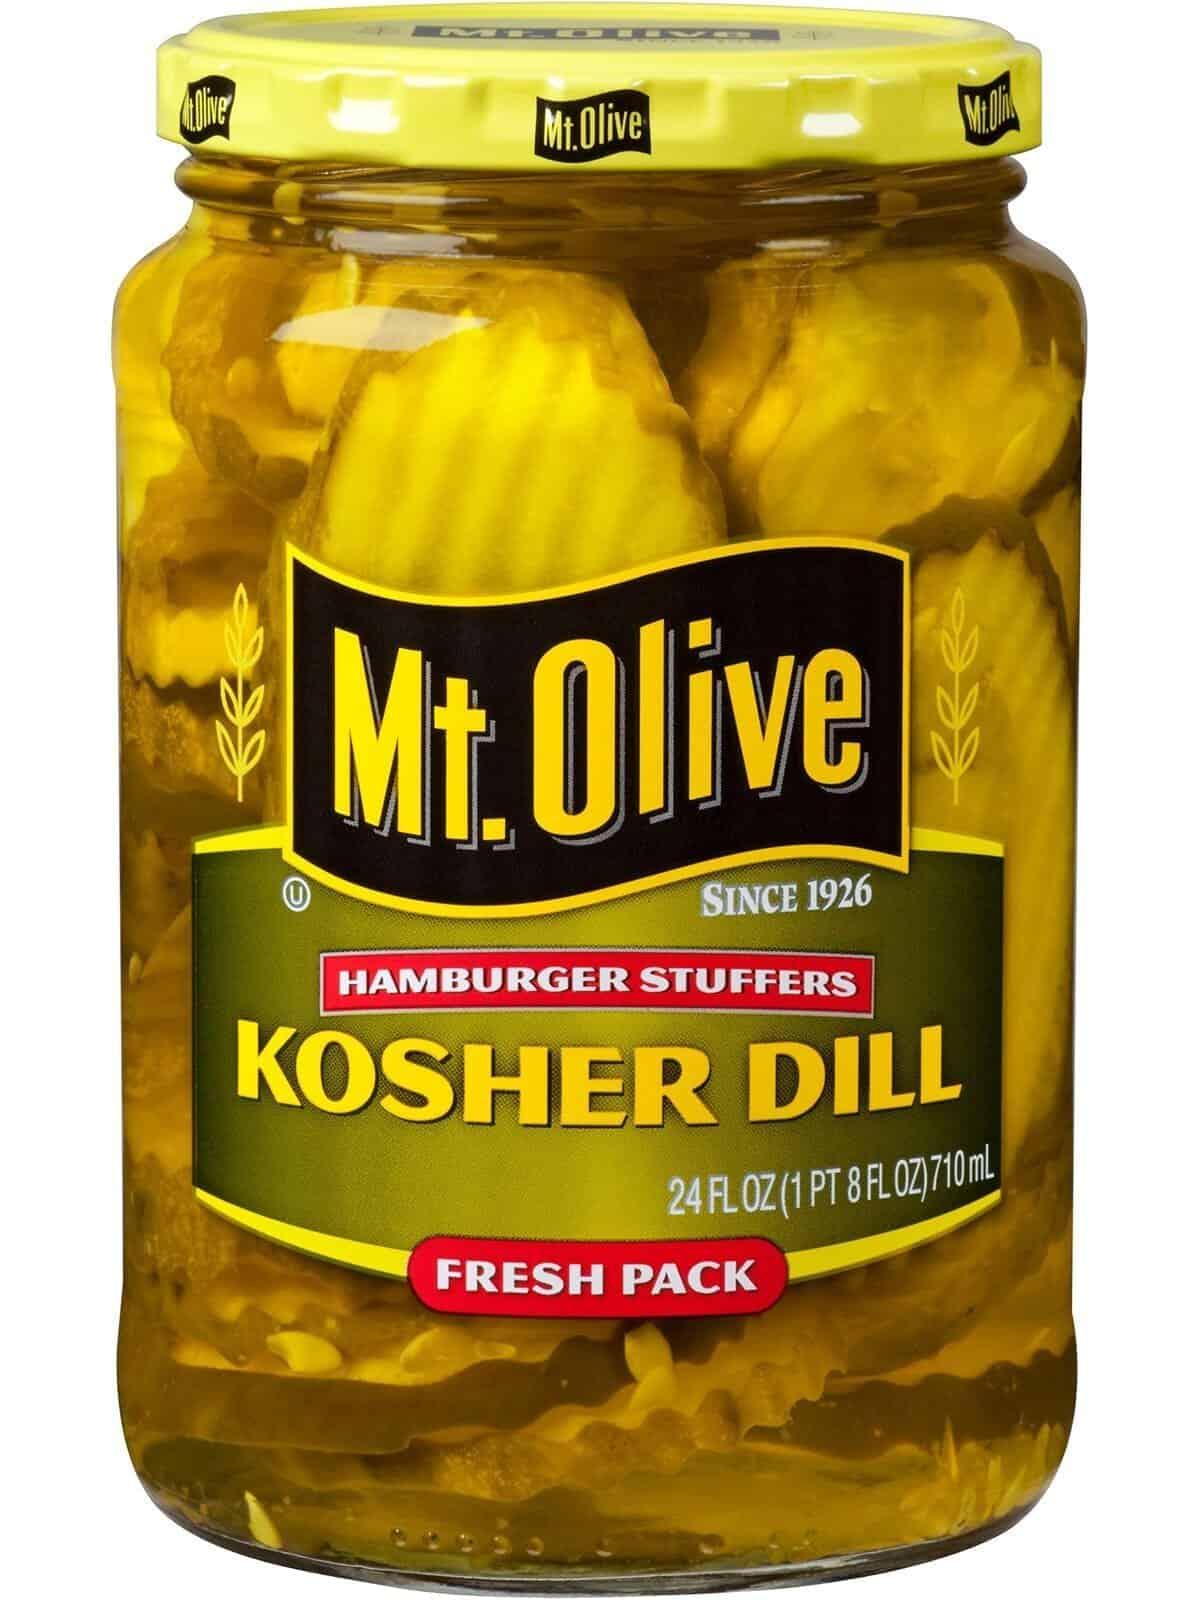 Kosher Dill Hamburger Stuffers